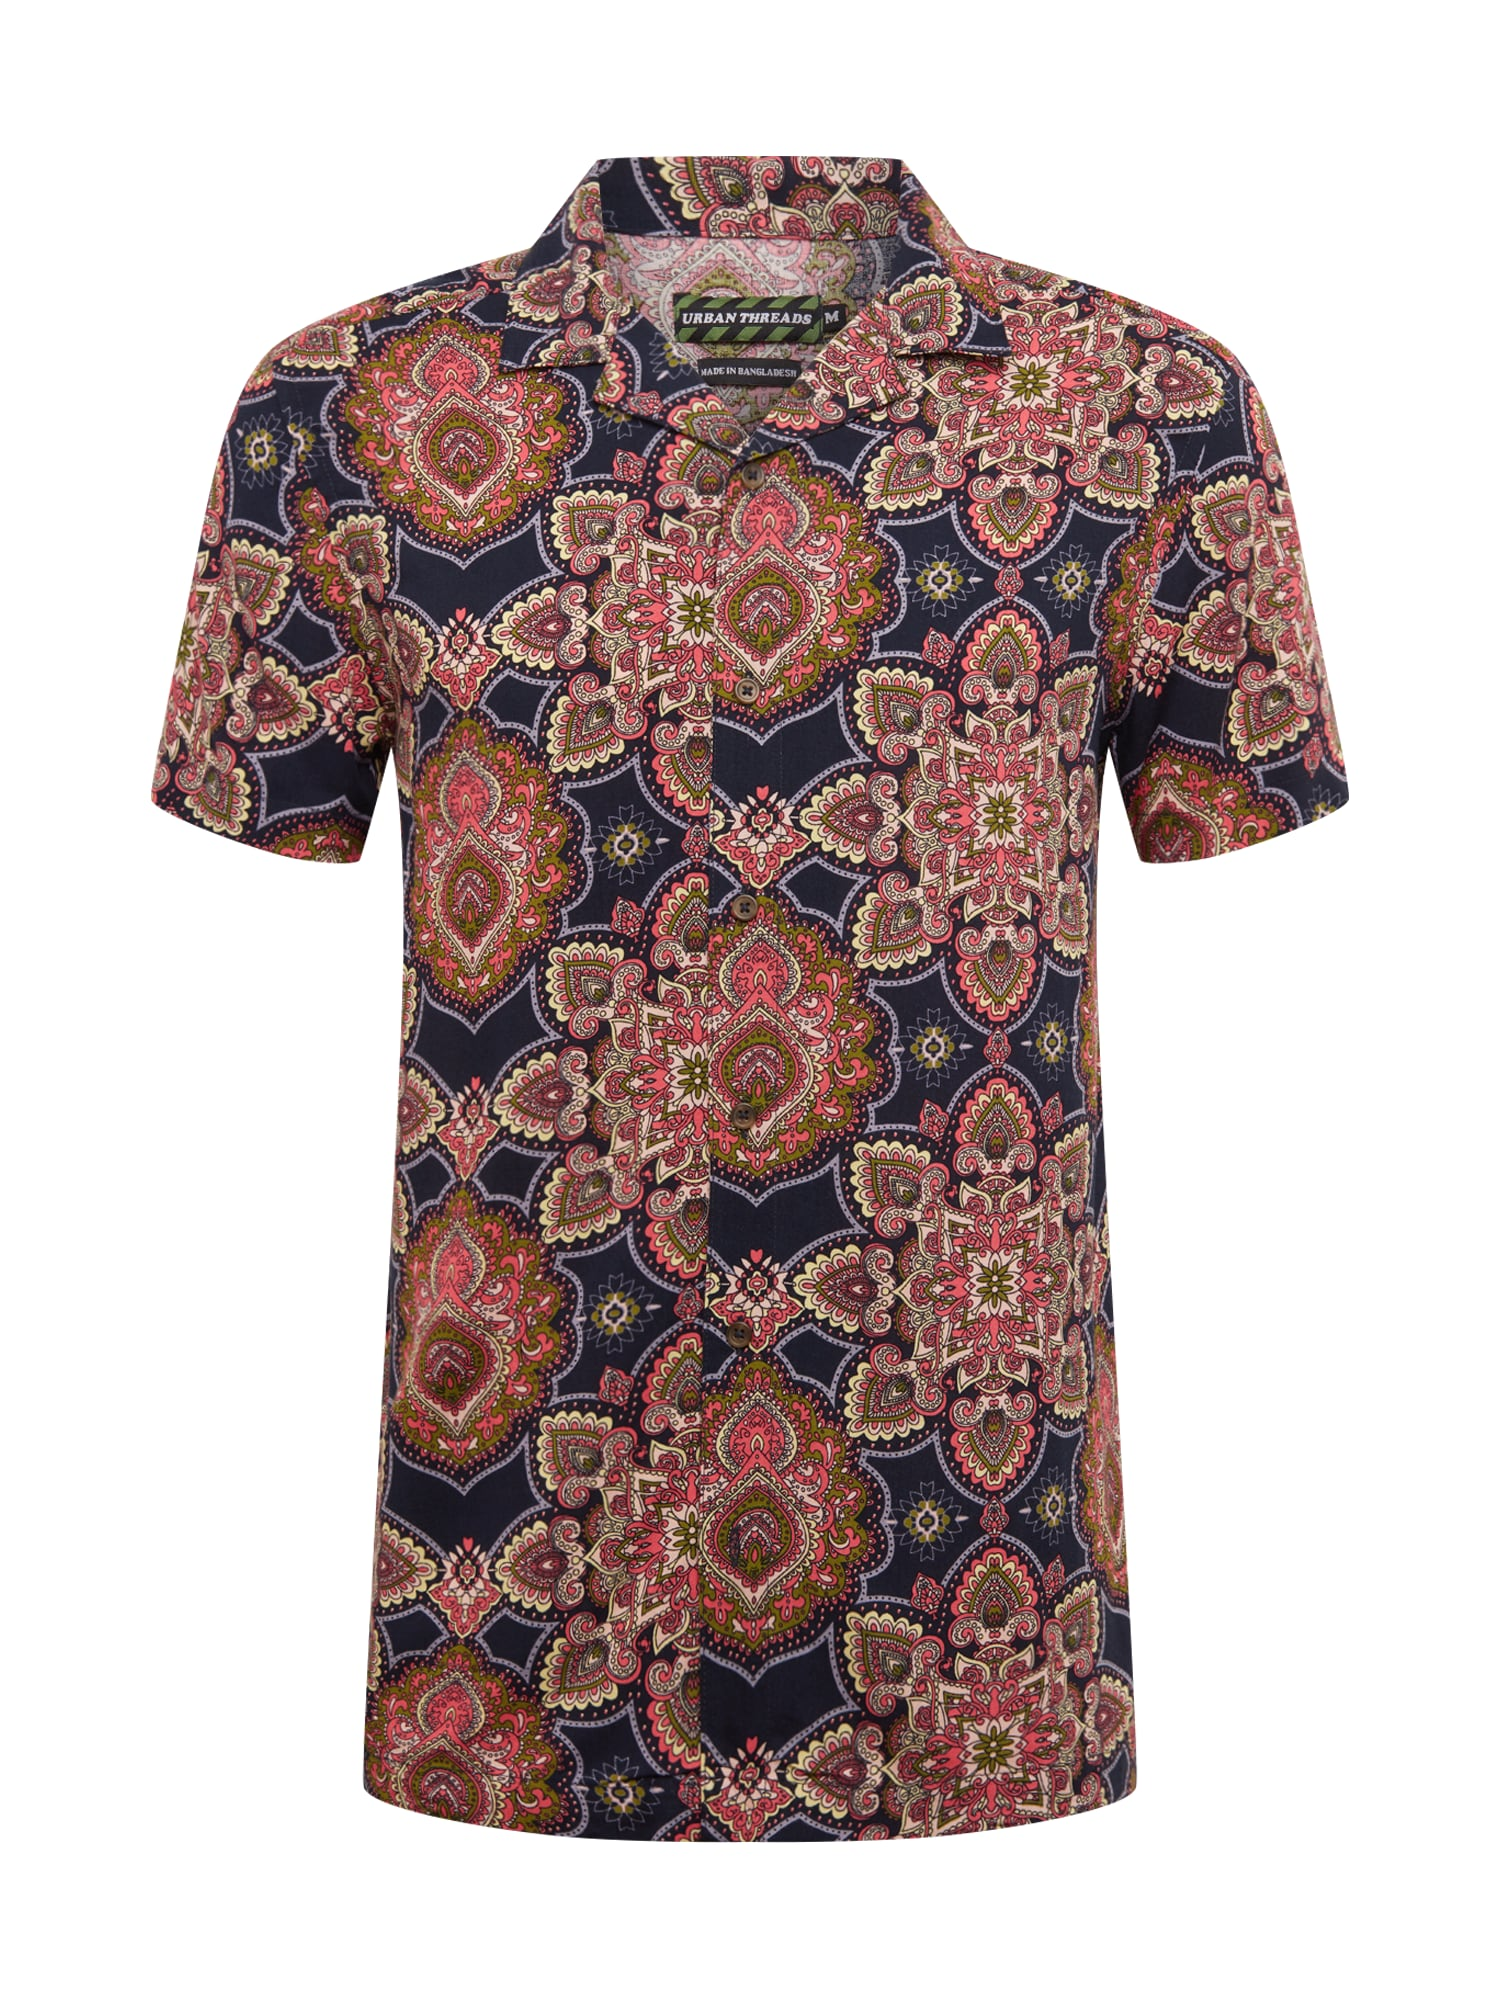 Urban Threads Košeľa 'Viscose Woven Shirt'  tmavomodrá / červené